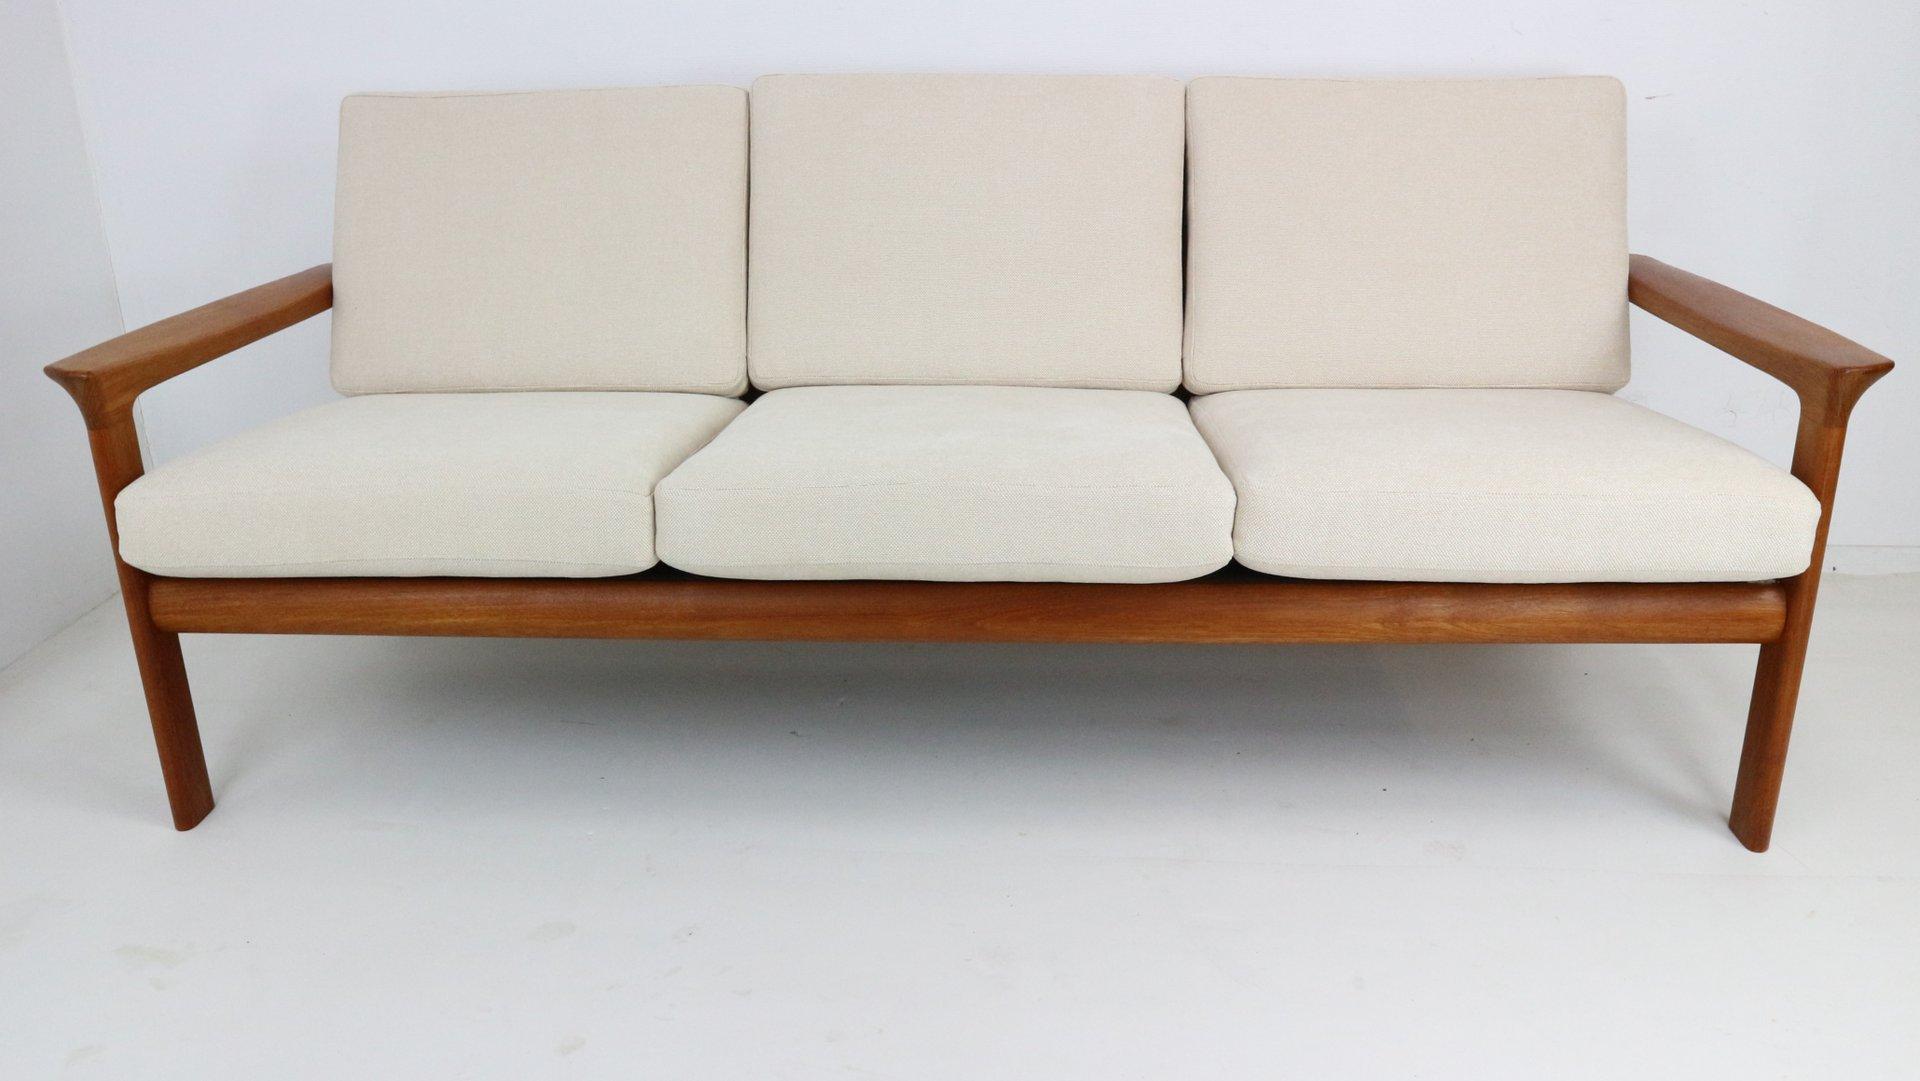 Danish Teak Three Seater Sofa By Sven Ellekaer For Komfort 1960s For Sale At Pamono